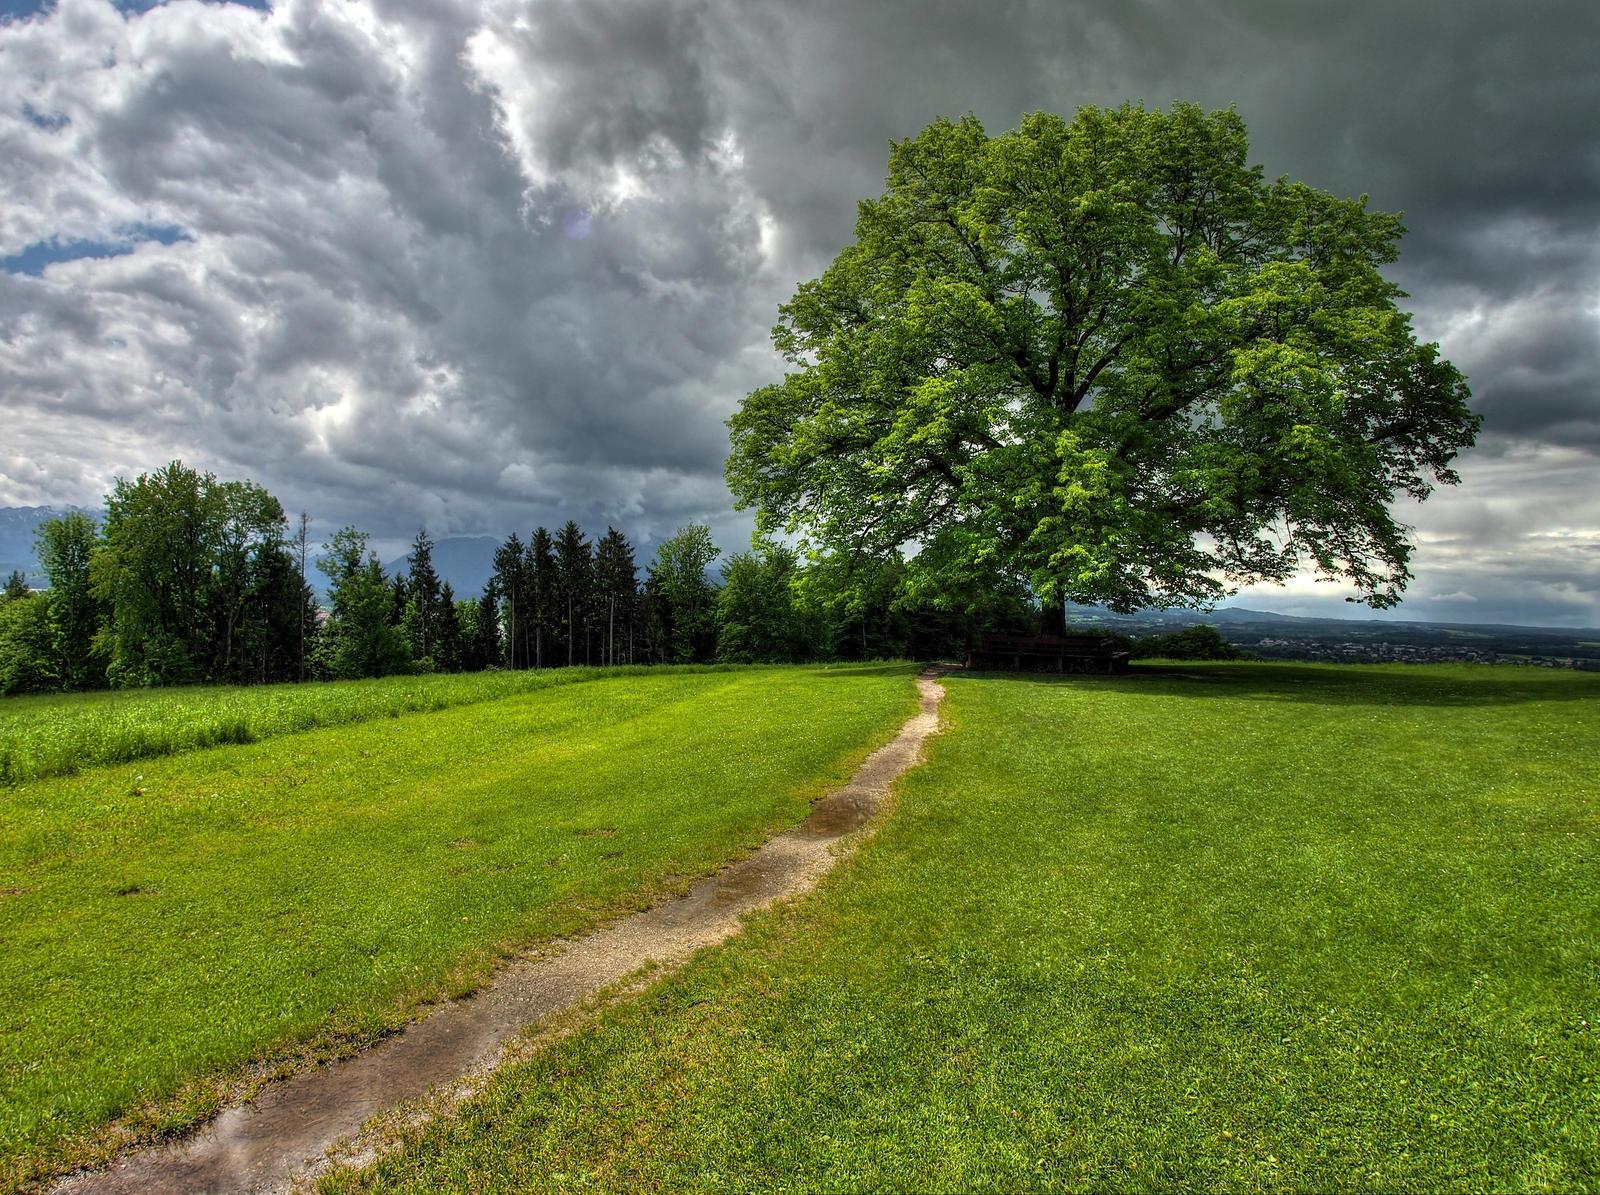 There Will Be Rain by Burtn